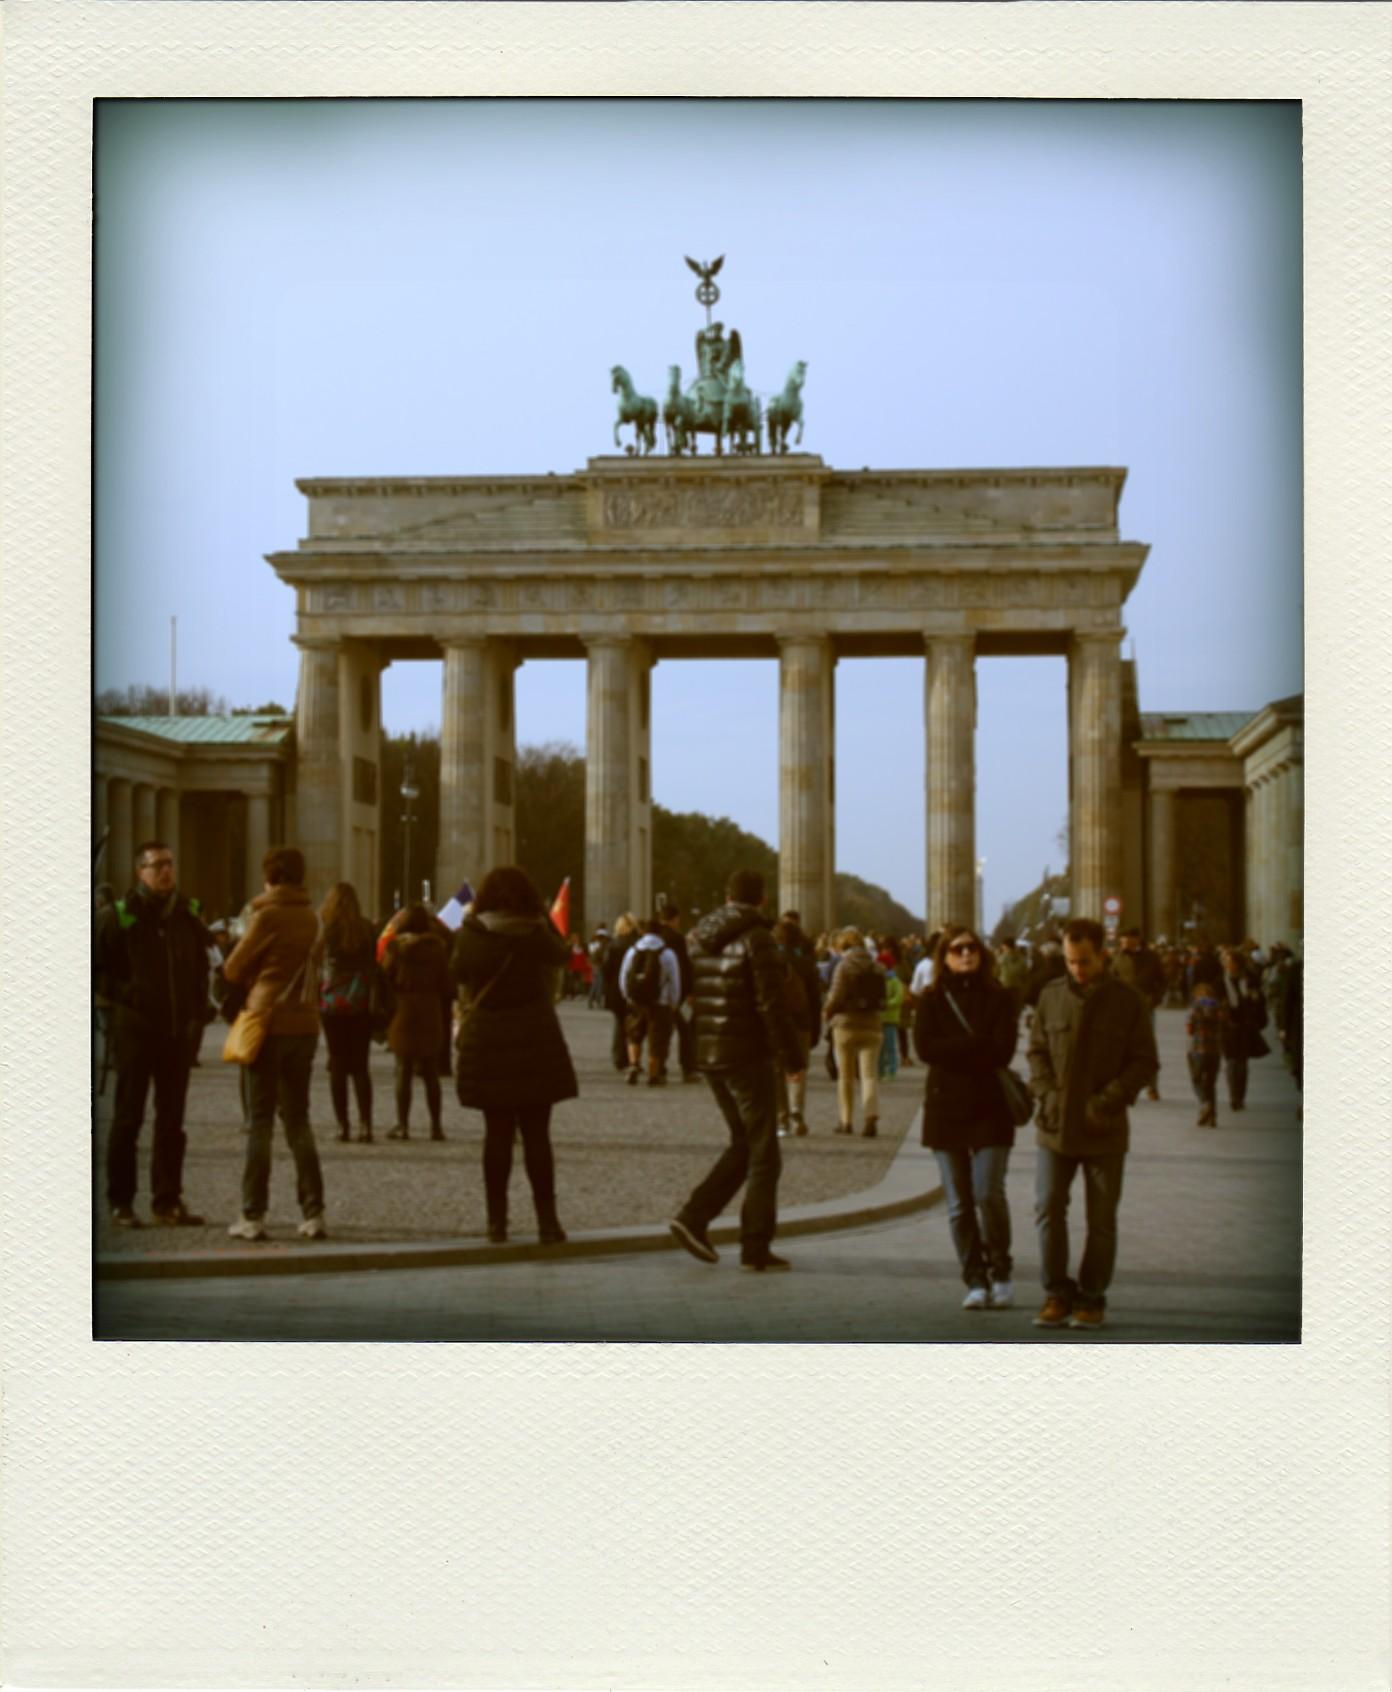 RTW Brandenburg Gate polaroid